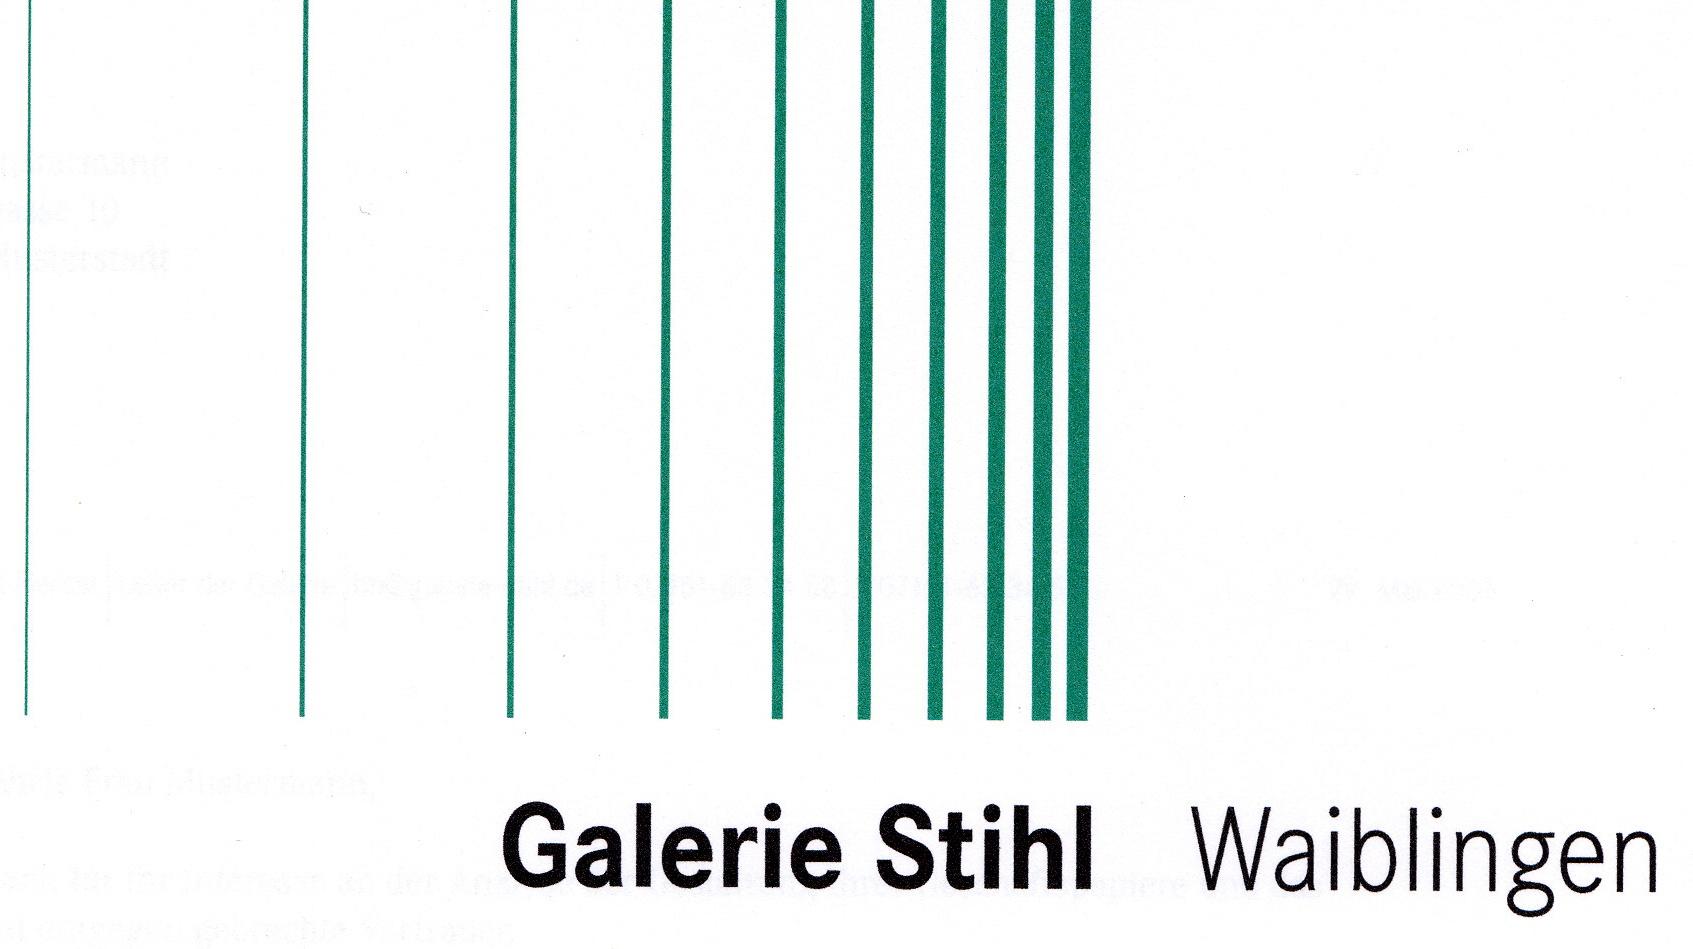 Logo der Galerie Stihl Waiblingen